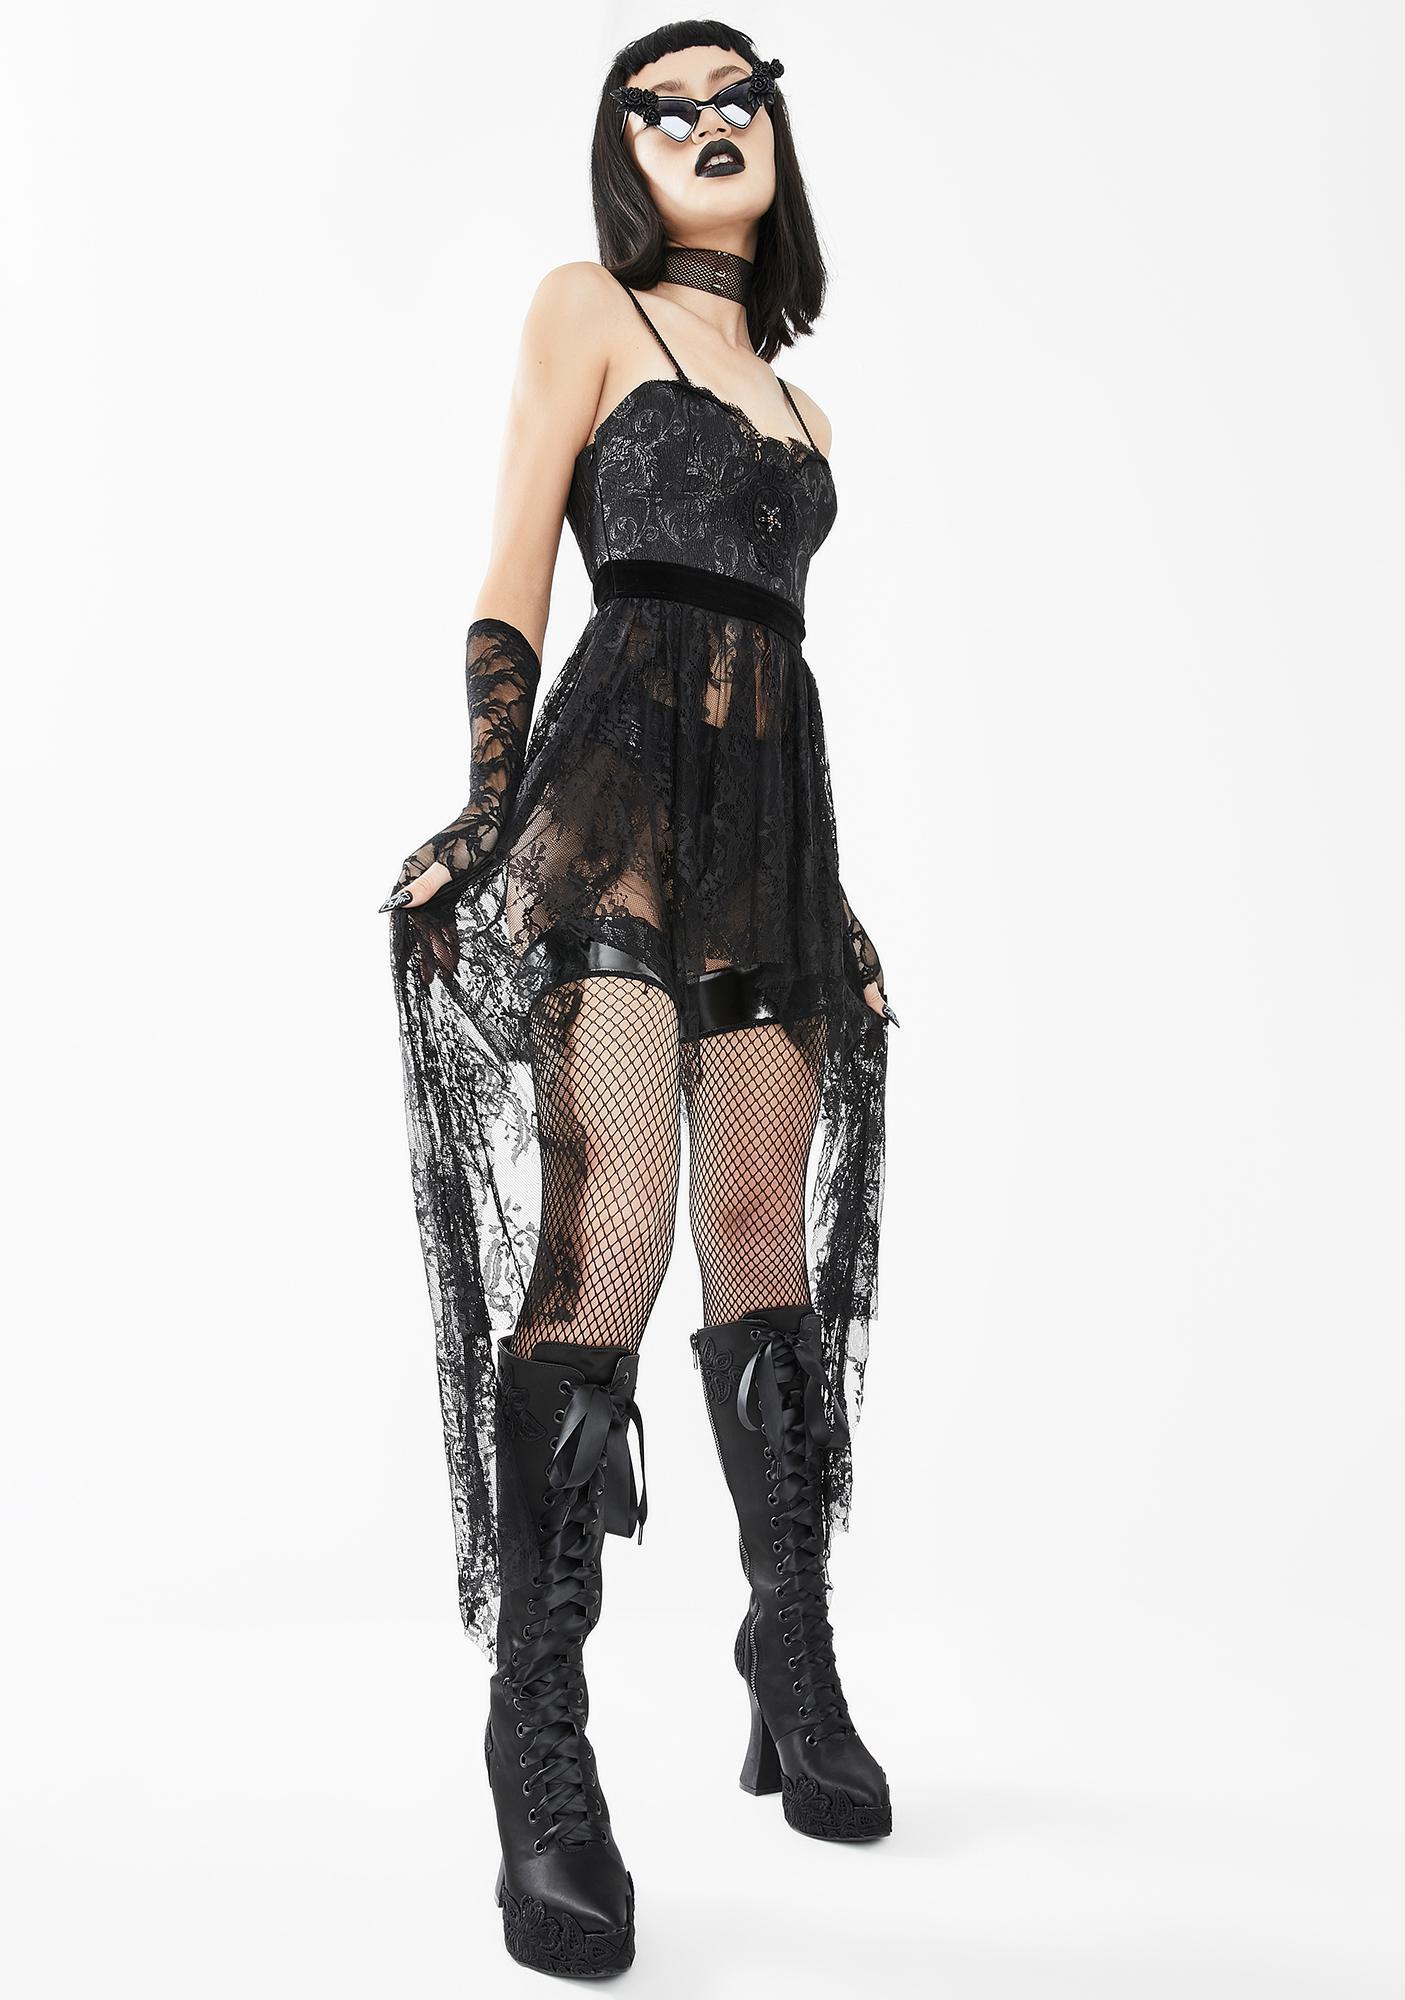 Eva Lady Black Lace Bustier Dress